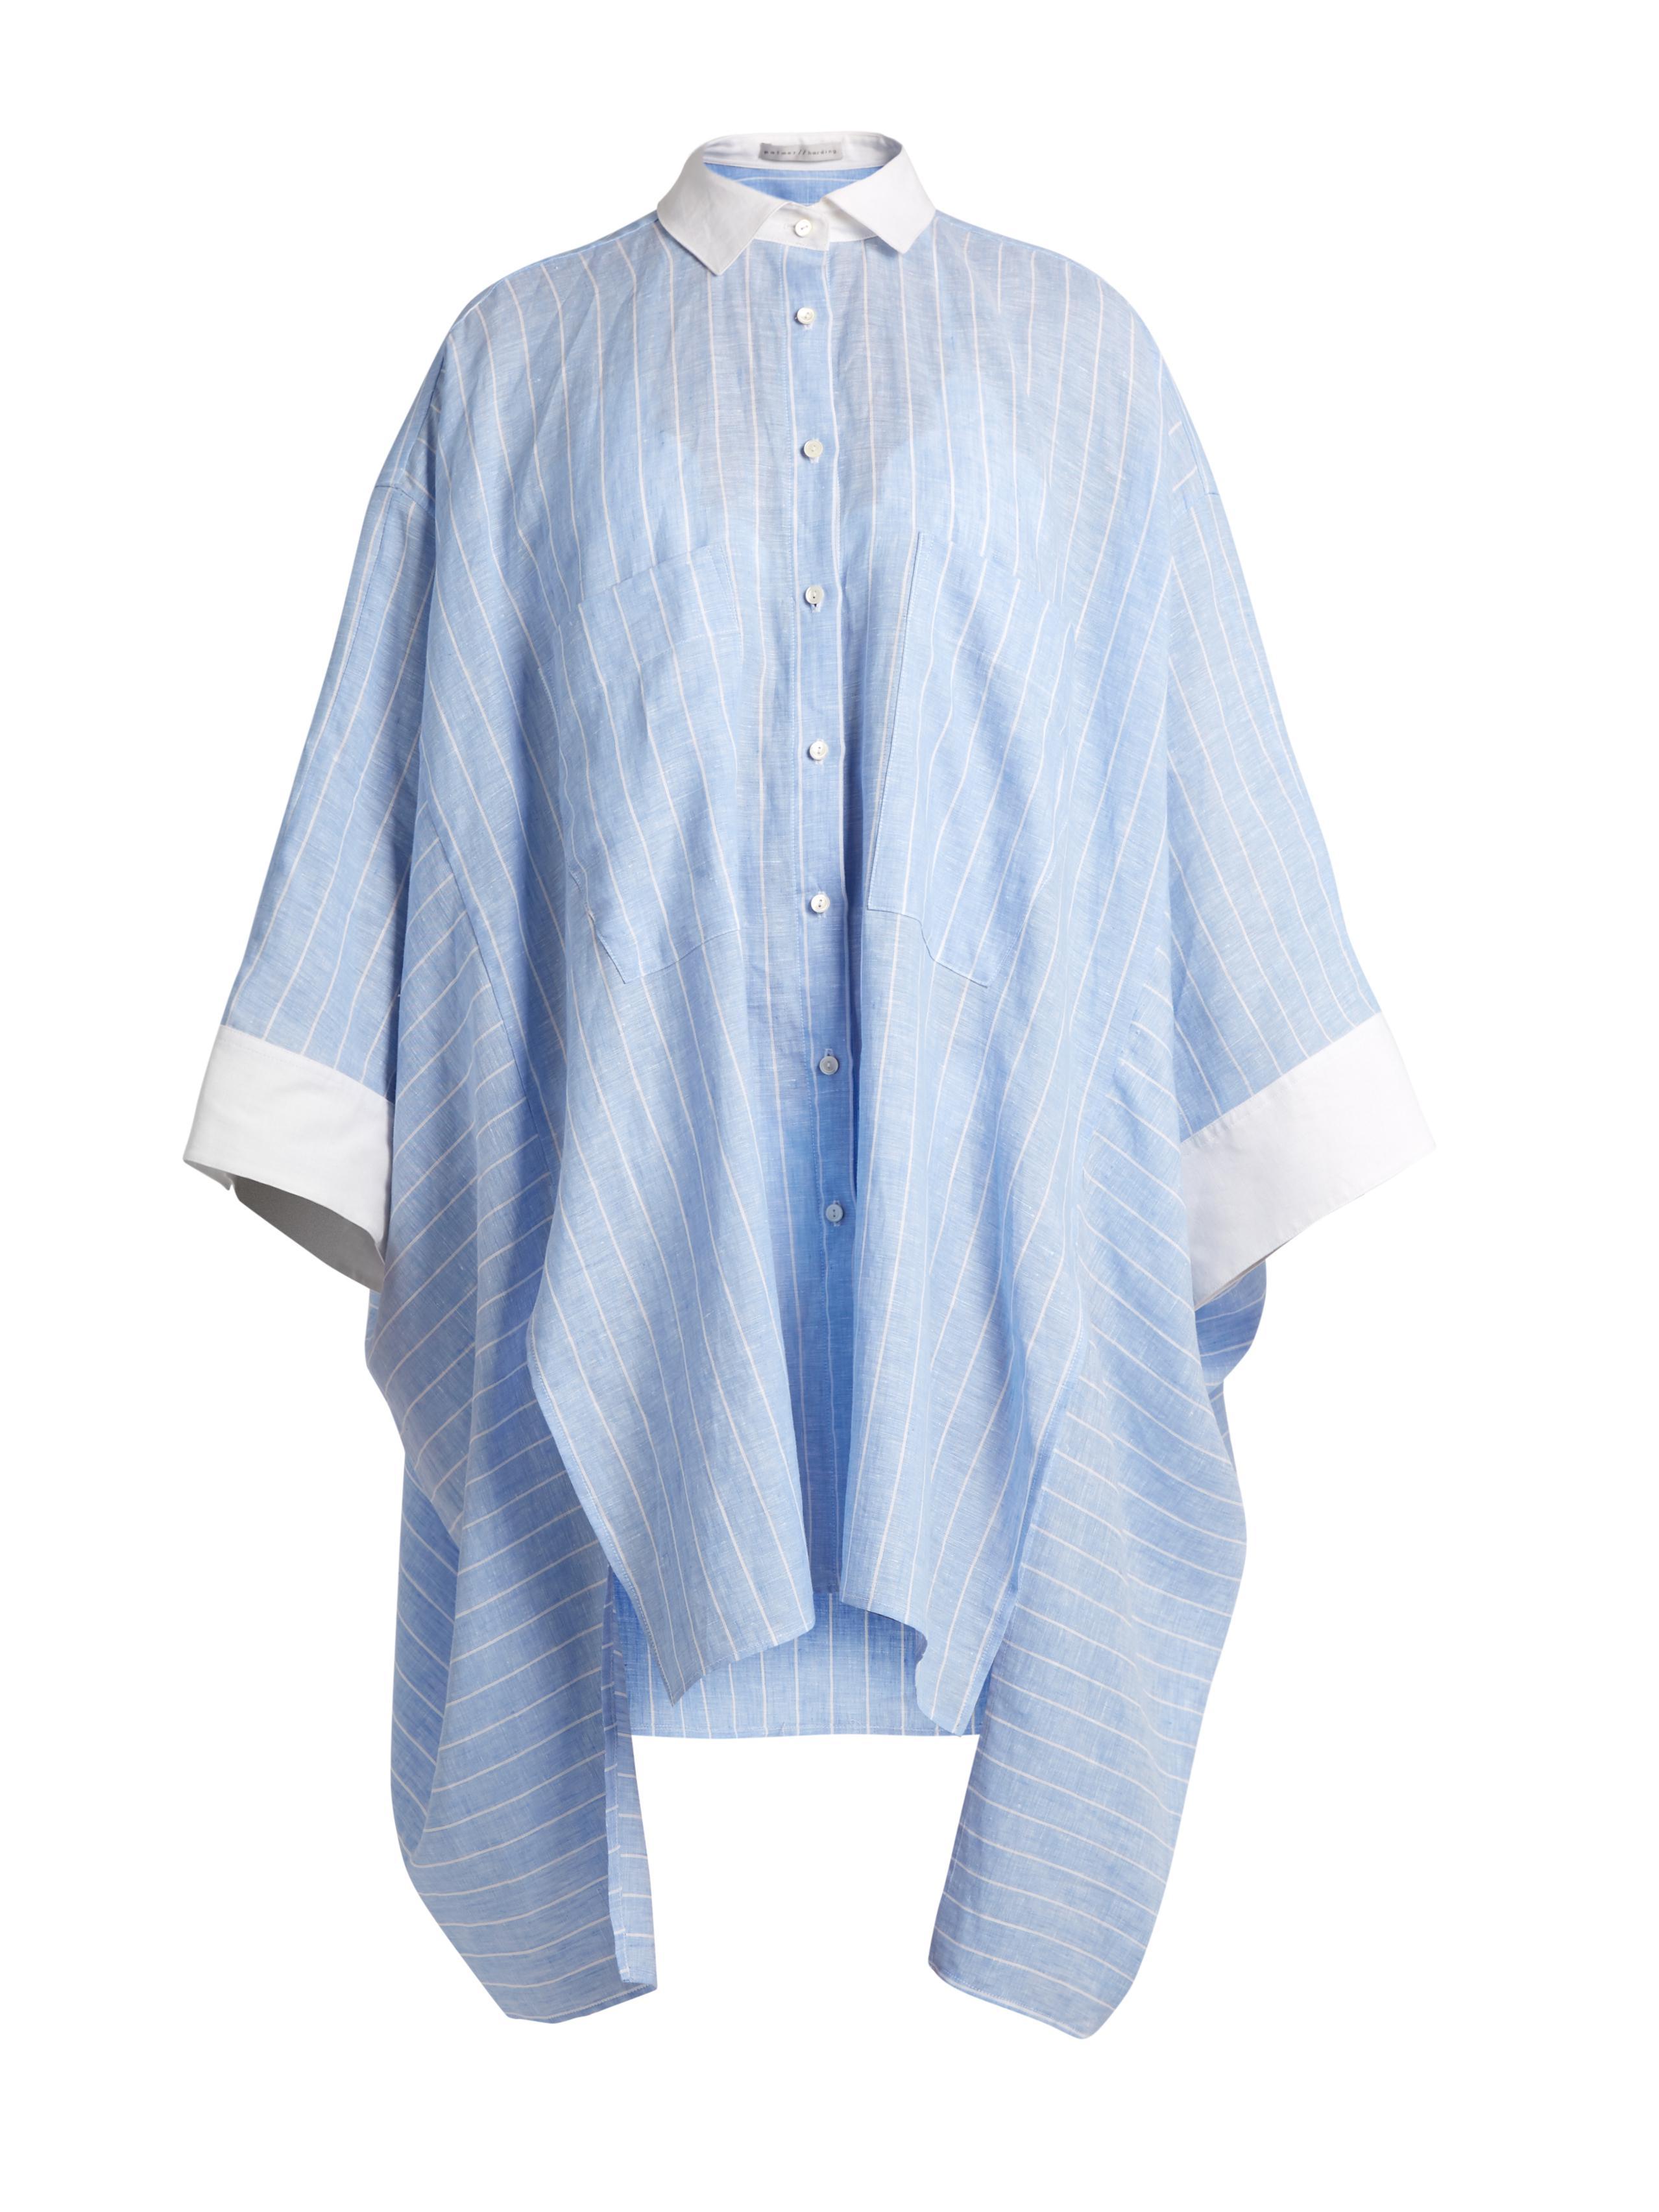 Discount Best Seller Factory Outlet Cheap Online Asymmetric linen shirt Palmer//harding Outlet Hot Sale Online For Sale Cheap Order 8Pt9Lixwc